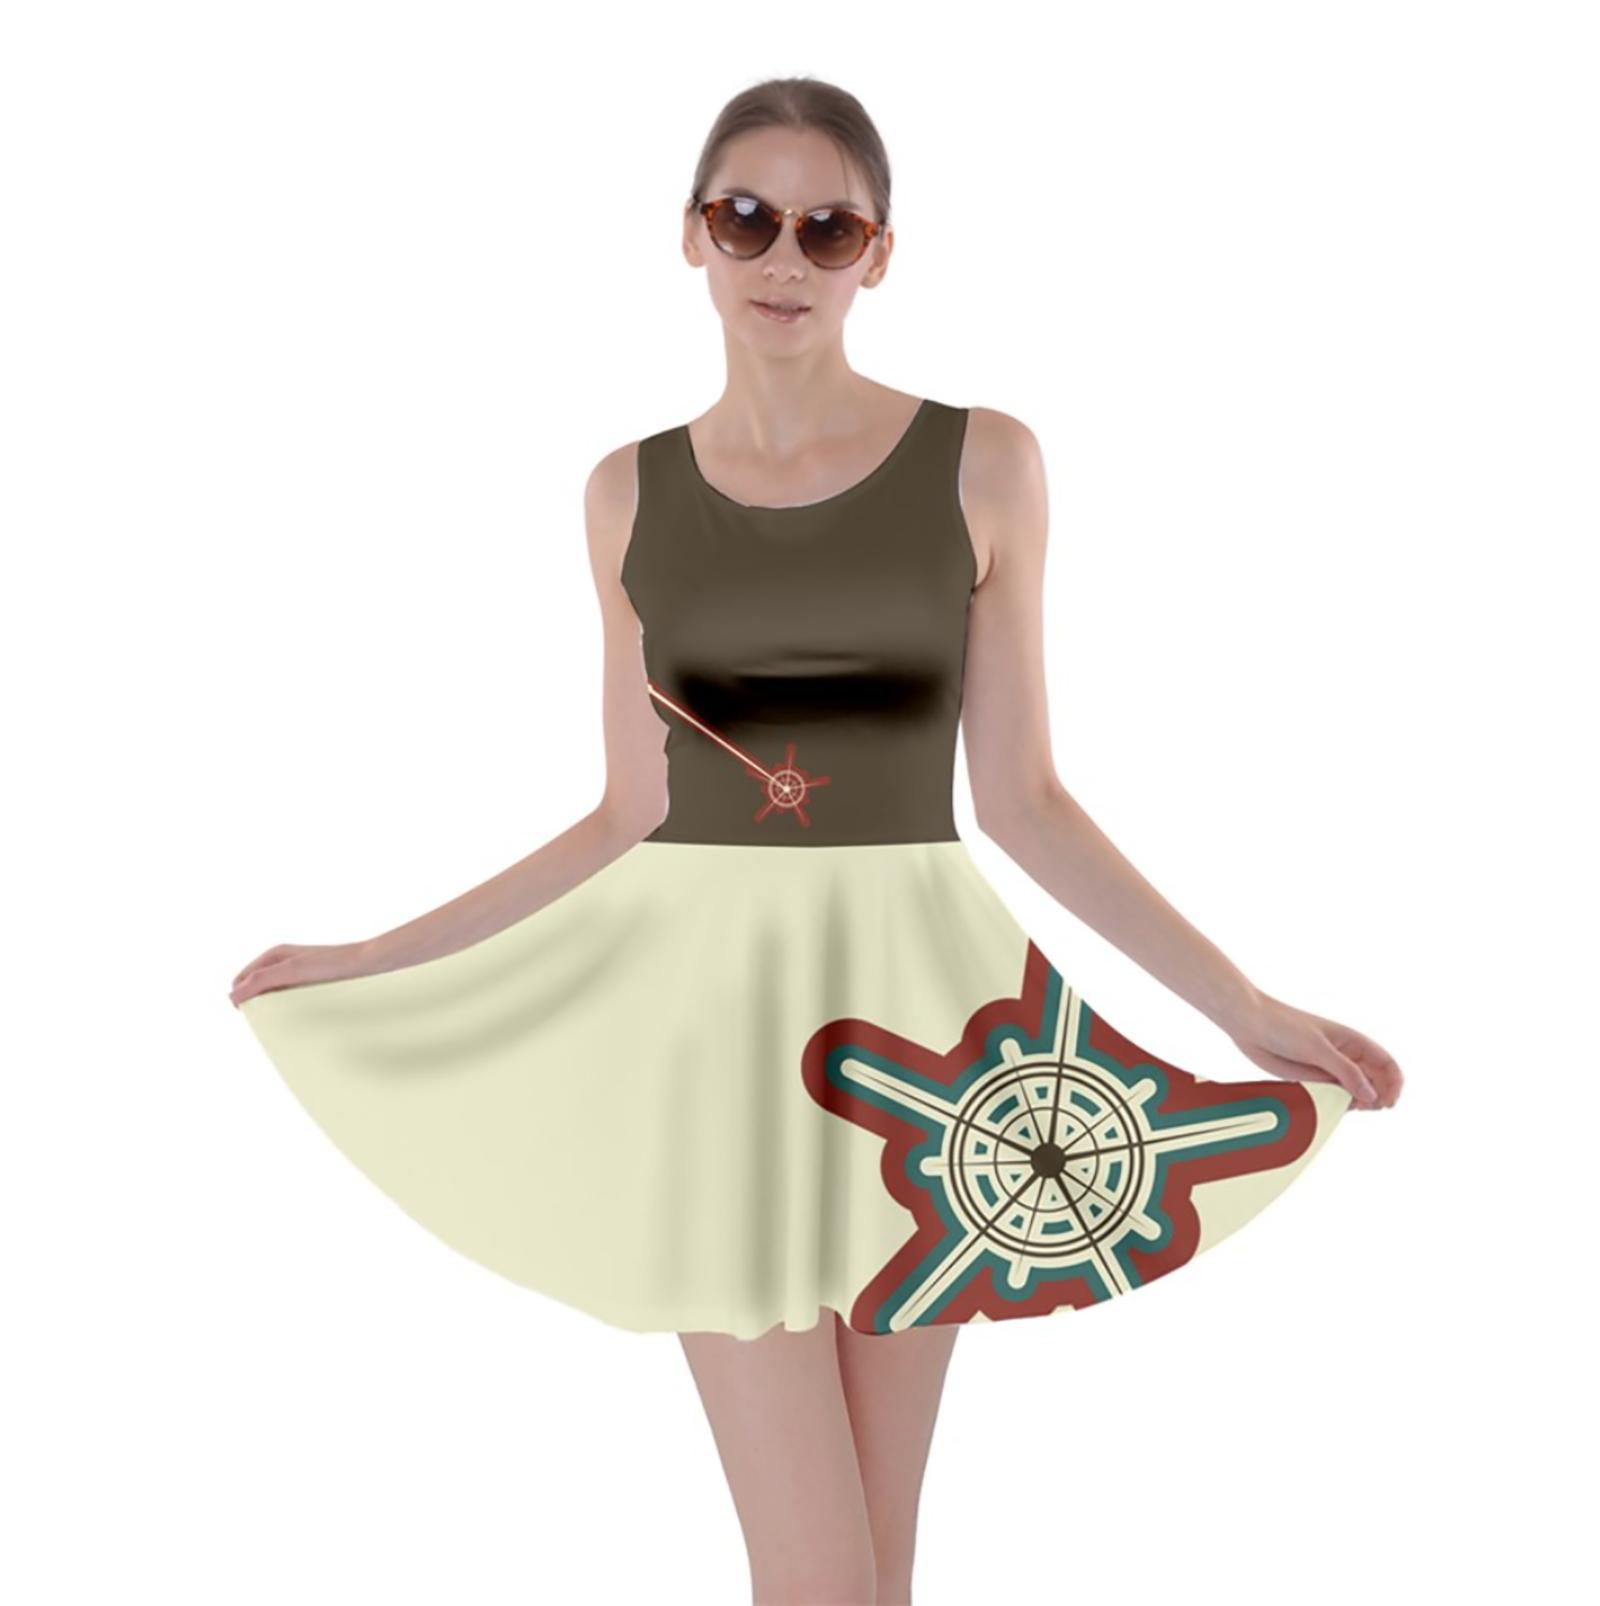 Vintage Emoji Owl Skater Dress (Dark Top w/Red Wand, Solid Bottom)